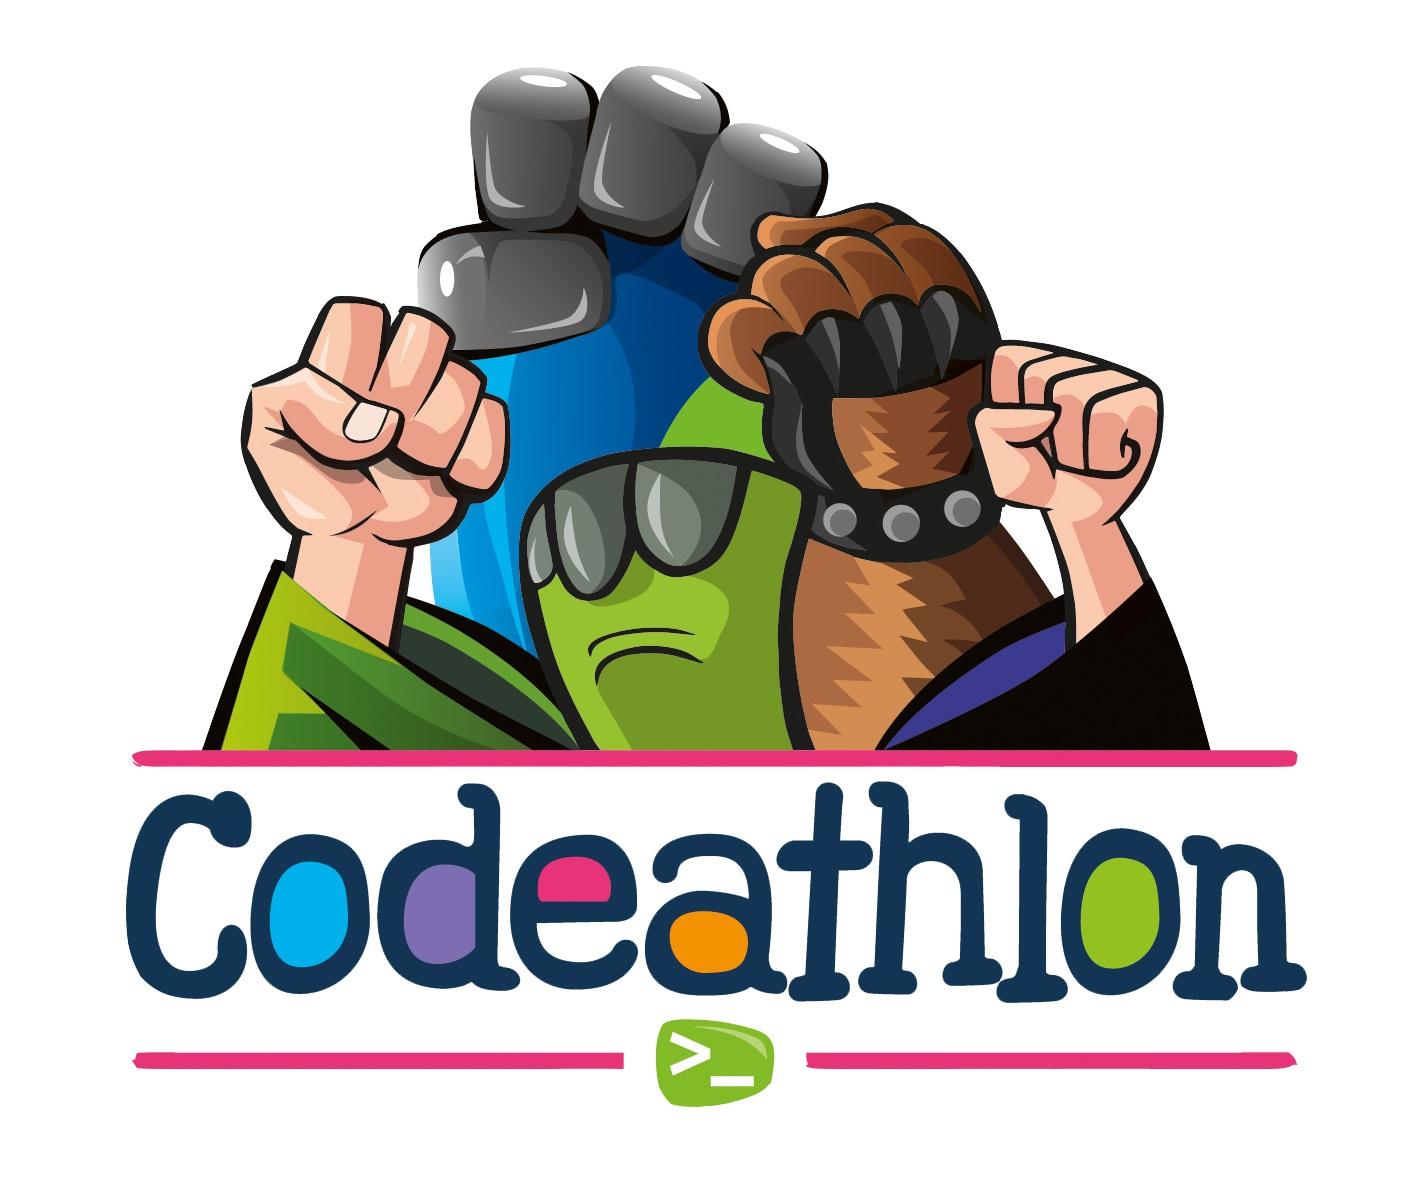 Registration open for the Codeathlon Winter Edition